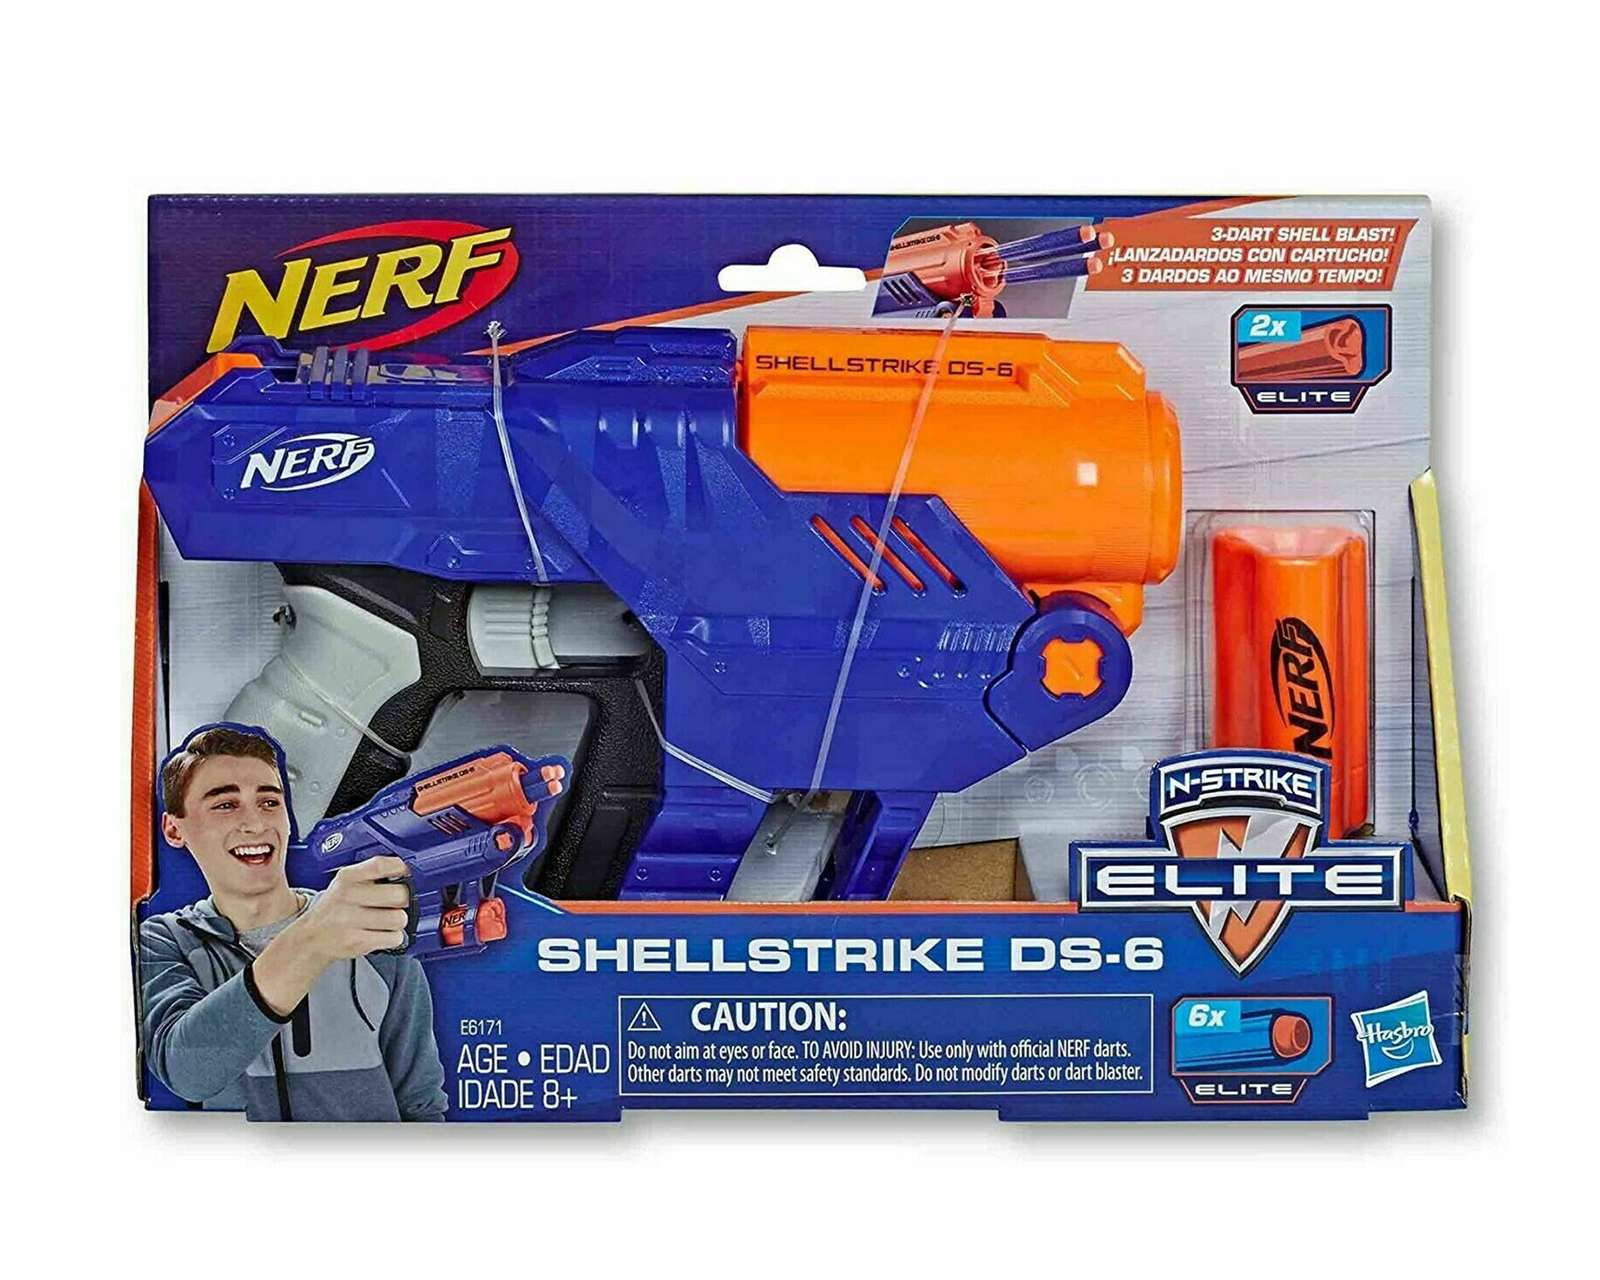 Buy Nerf Elite Shellstrike DS 6 Blaster at MaxGaming.com